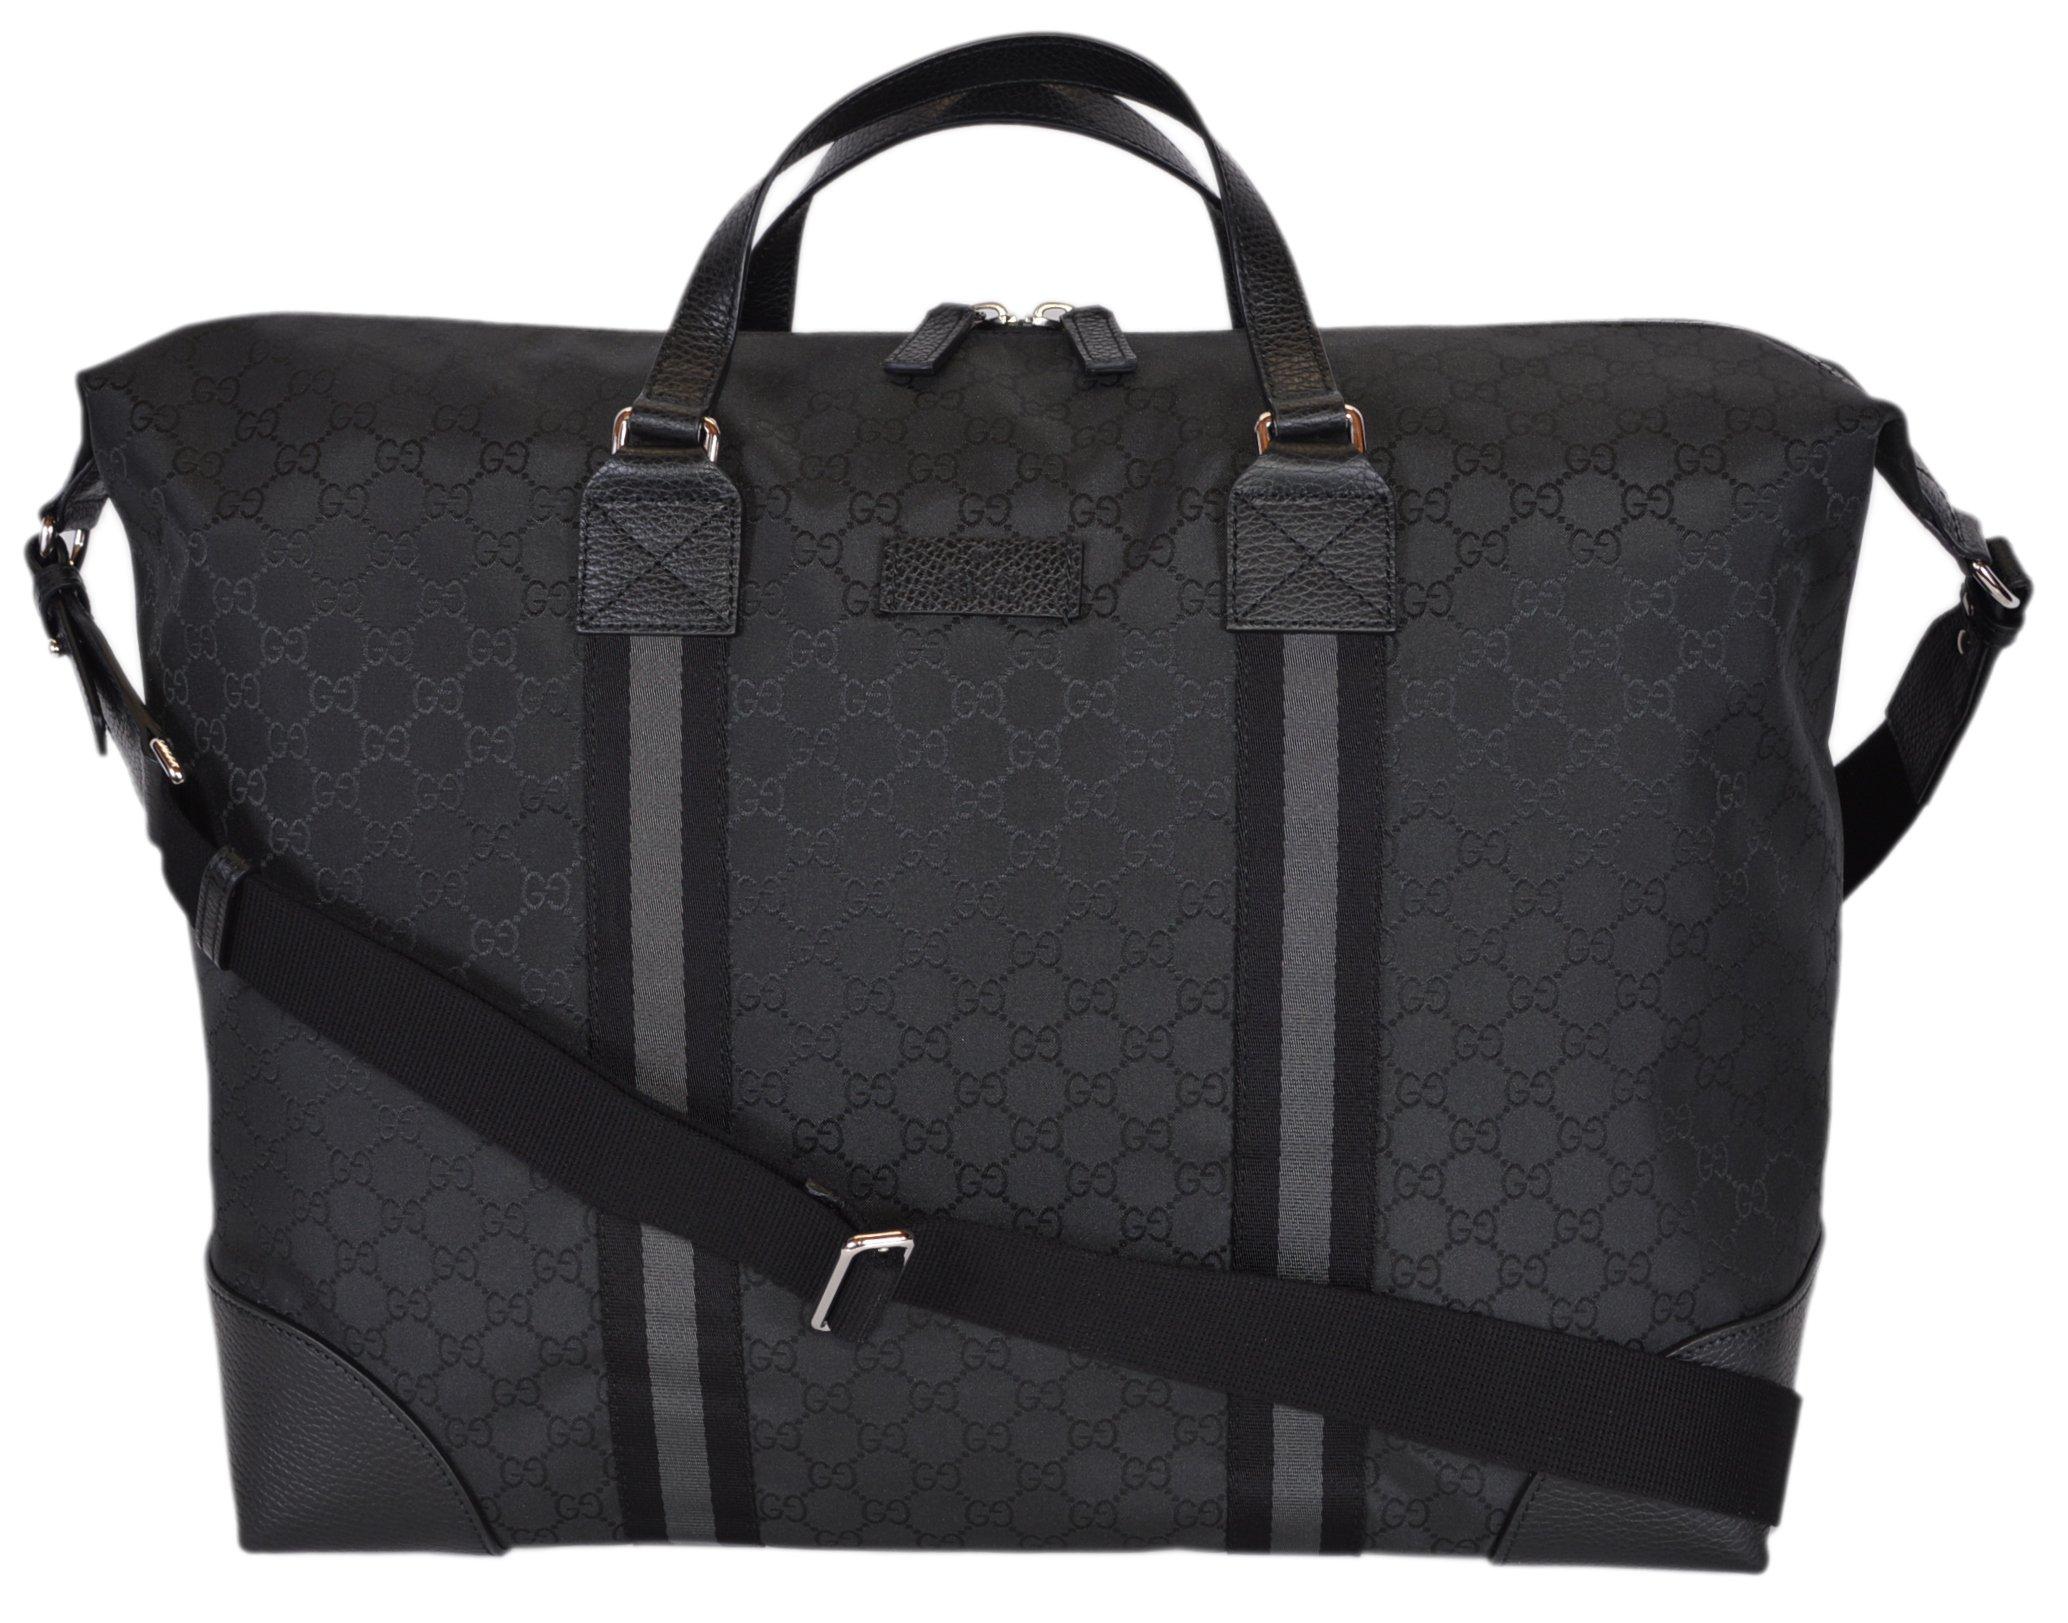 6d8ddc1113 Gucci Nylon GG Guccissima XL Travel Duffle Luggage Bag (449180/Black)